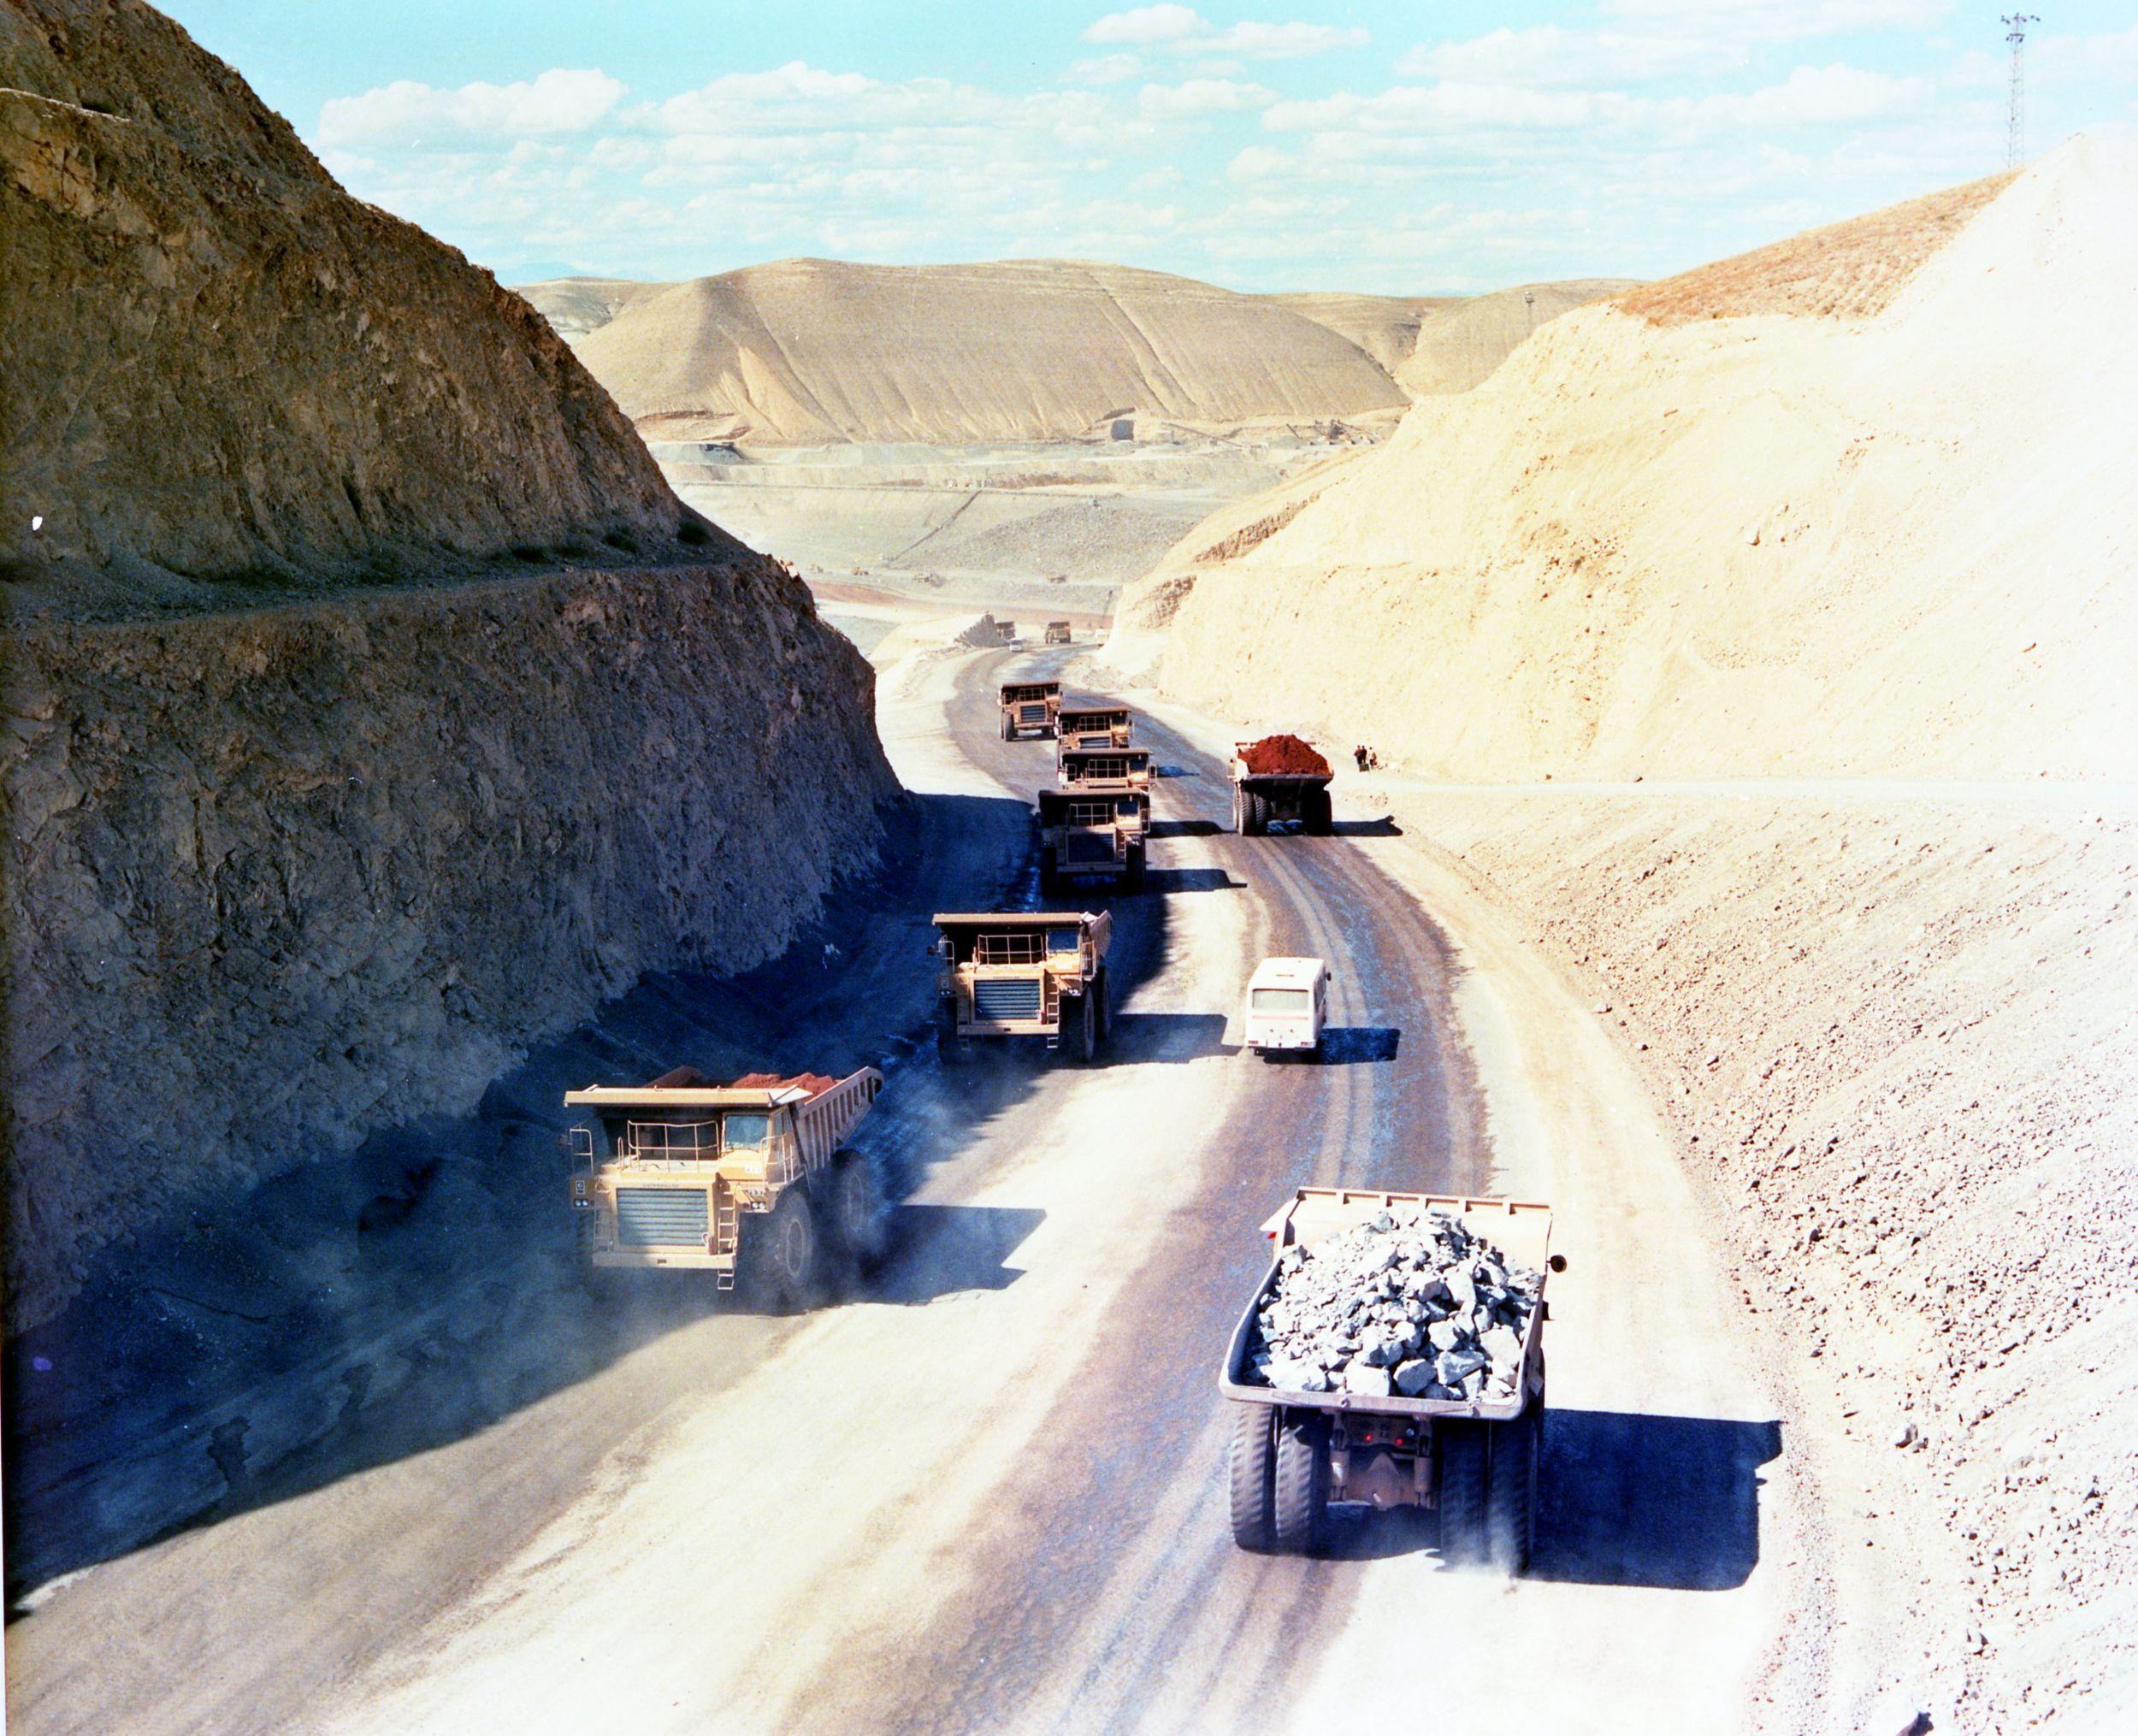 Ataturk Dam Dam Construction Project, 1987.